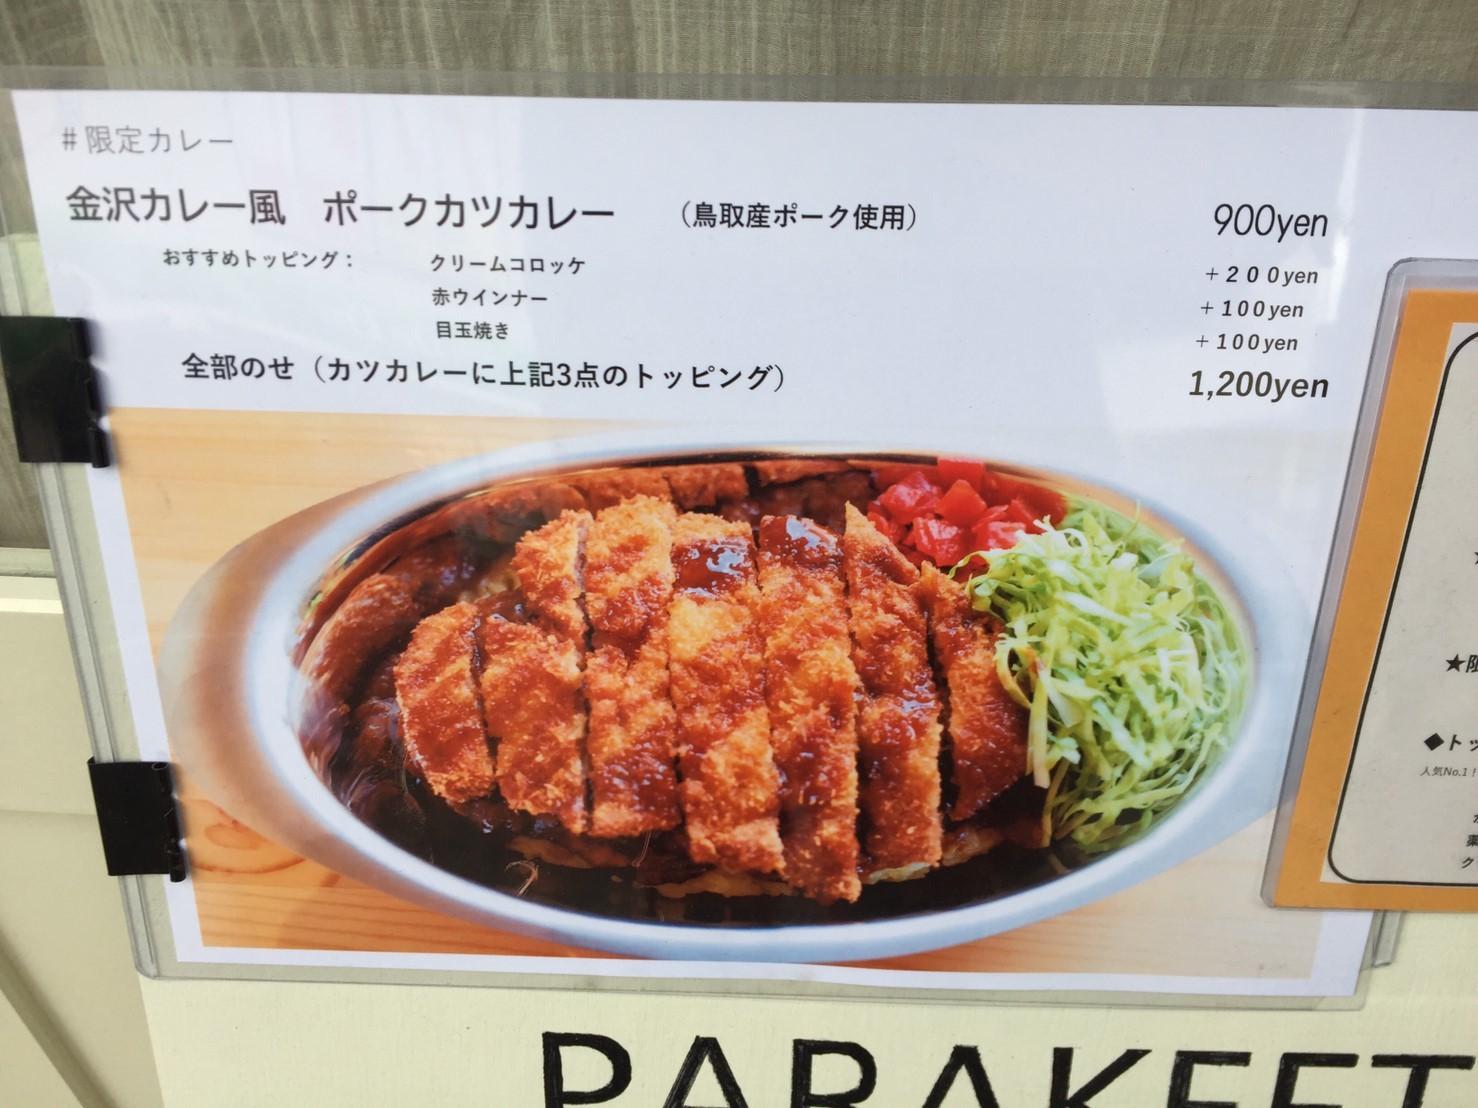 PARAKEET 限定カレー (金沢カレー風 ポークカツカレー)_e0115904_12205806.jpg